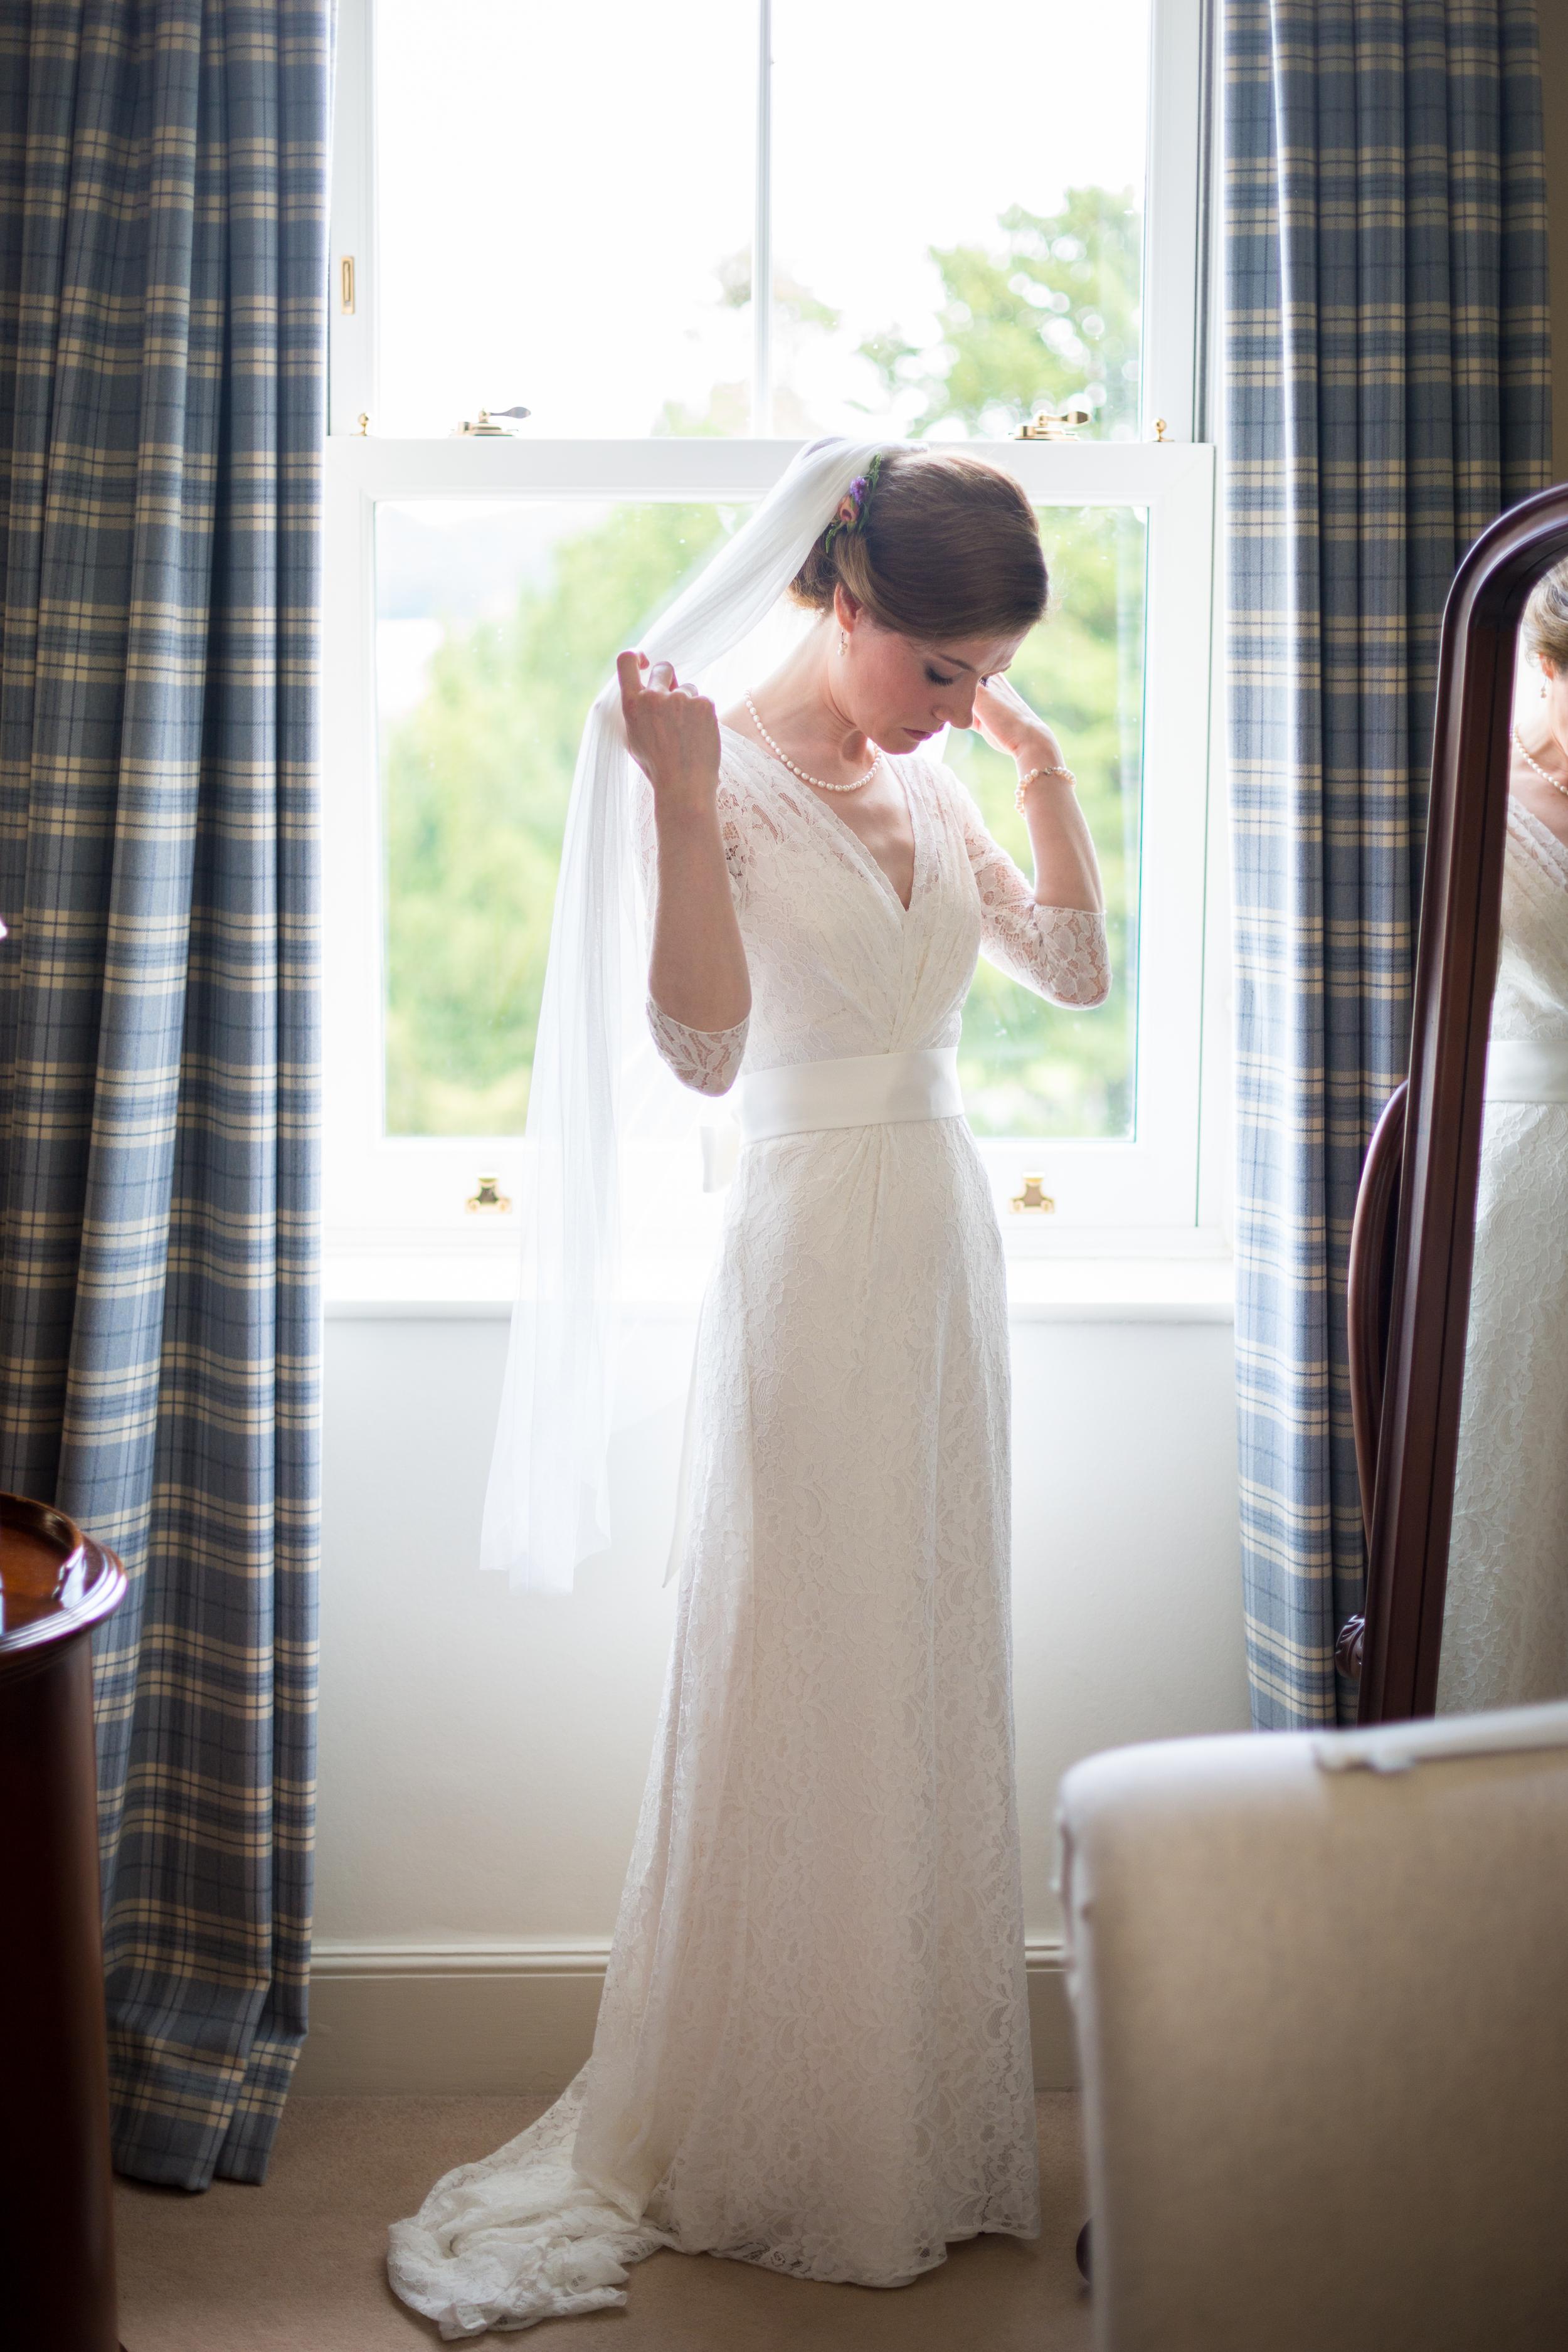 Freya wears the Halfpenny London Josephine wedding dress with a broad sash and fine tulle veil